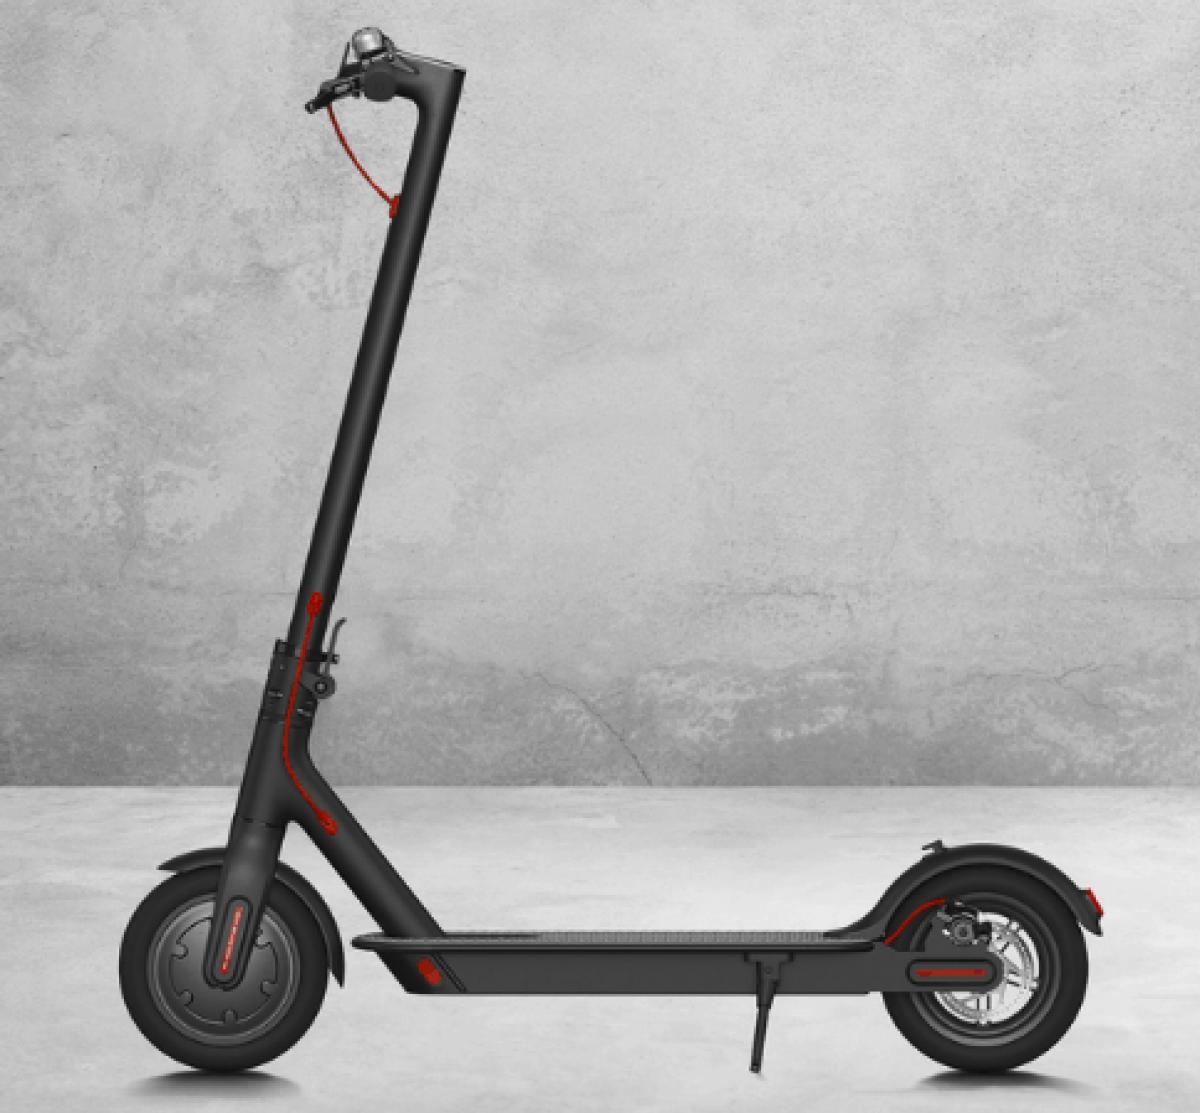 xiaomi m365 scooter european version. Black Bedroom Furniture Sets. Home Design Ideas